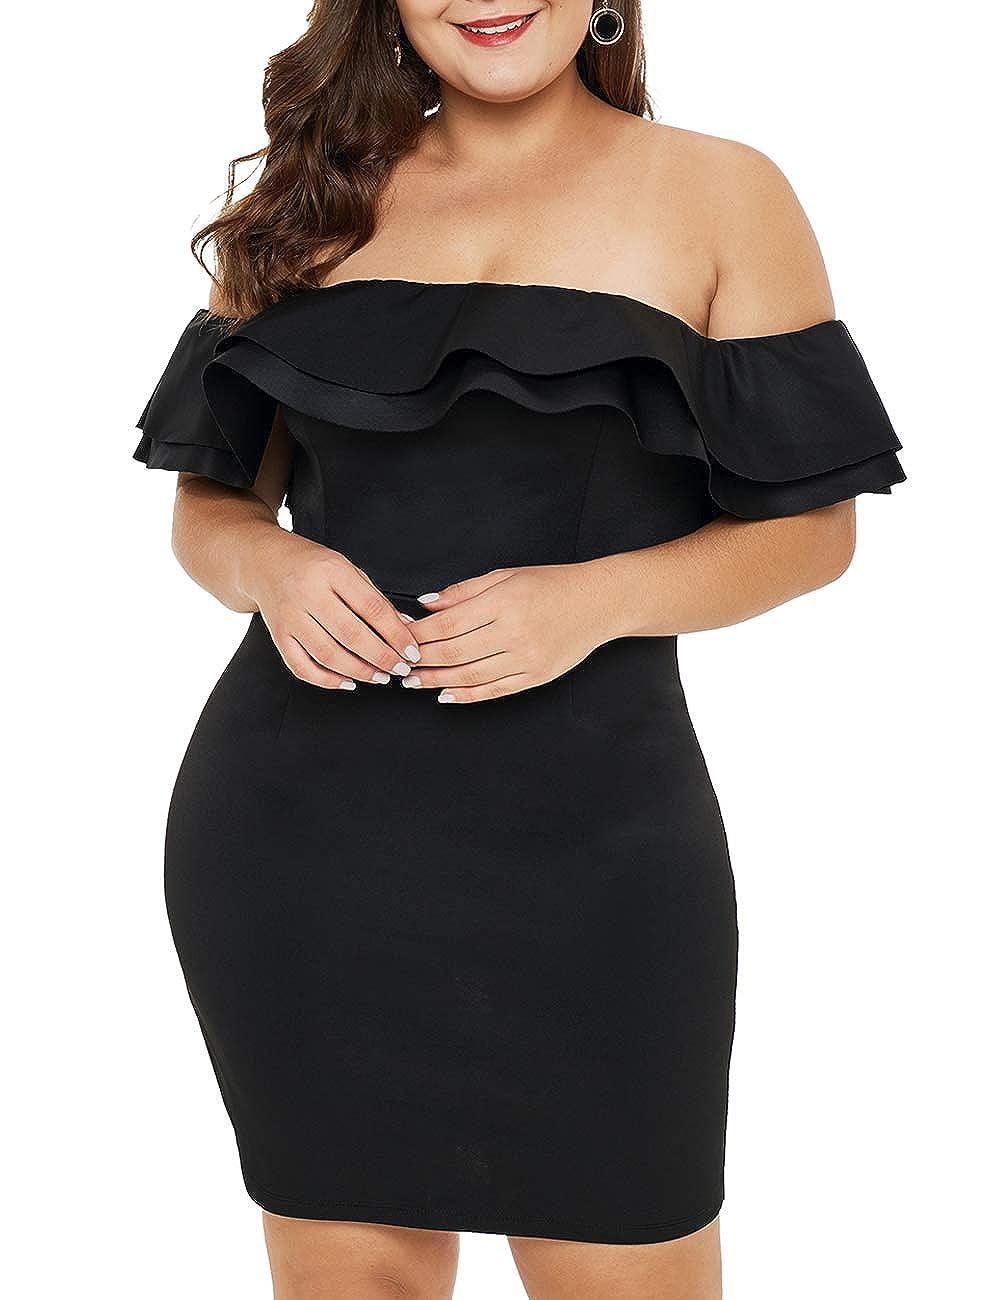 UINKKE Womens Plus Size Mini Dress Ruffle Off Shoulder Bodycon Party Dress